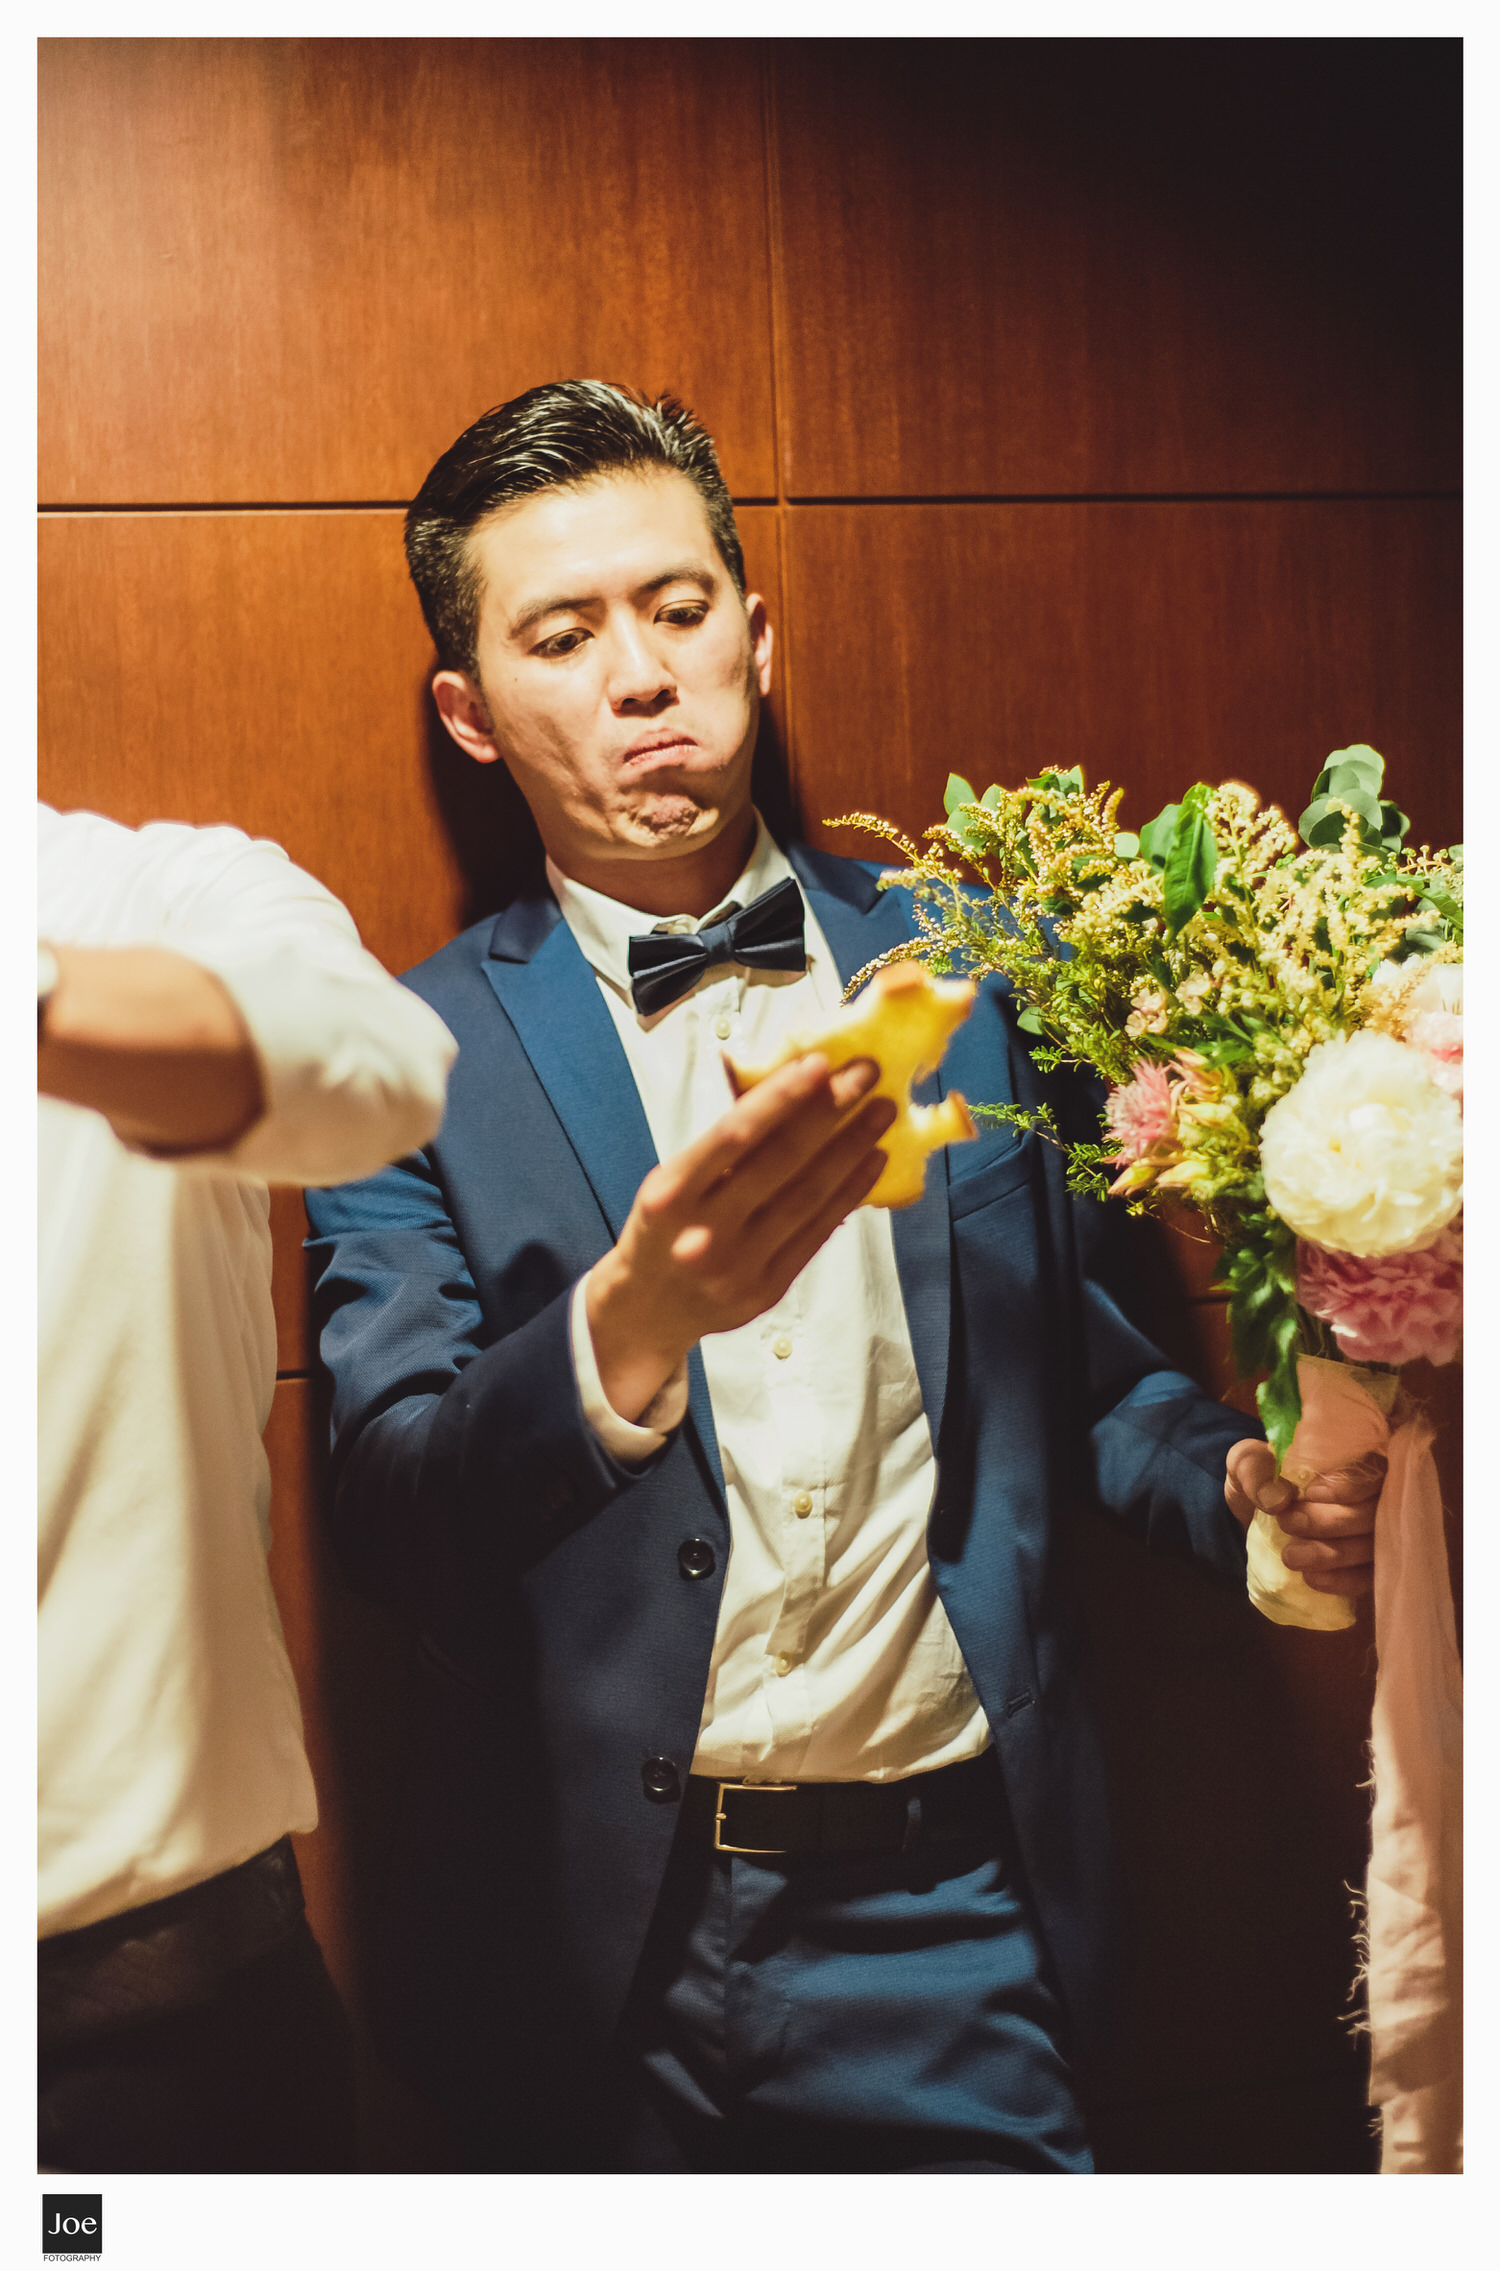 wedding-photography-shangri-la-far-eastern-plaza-hotel-ariel-sam-joe-fotography-058.jpg